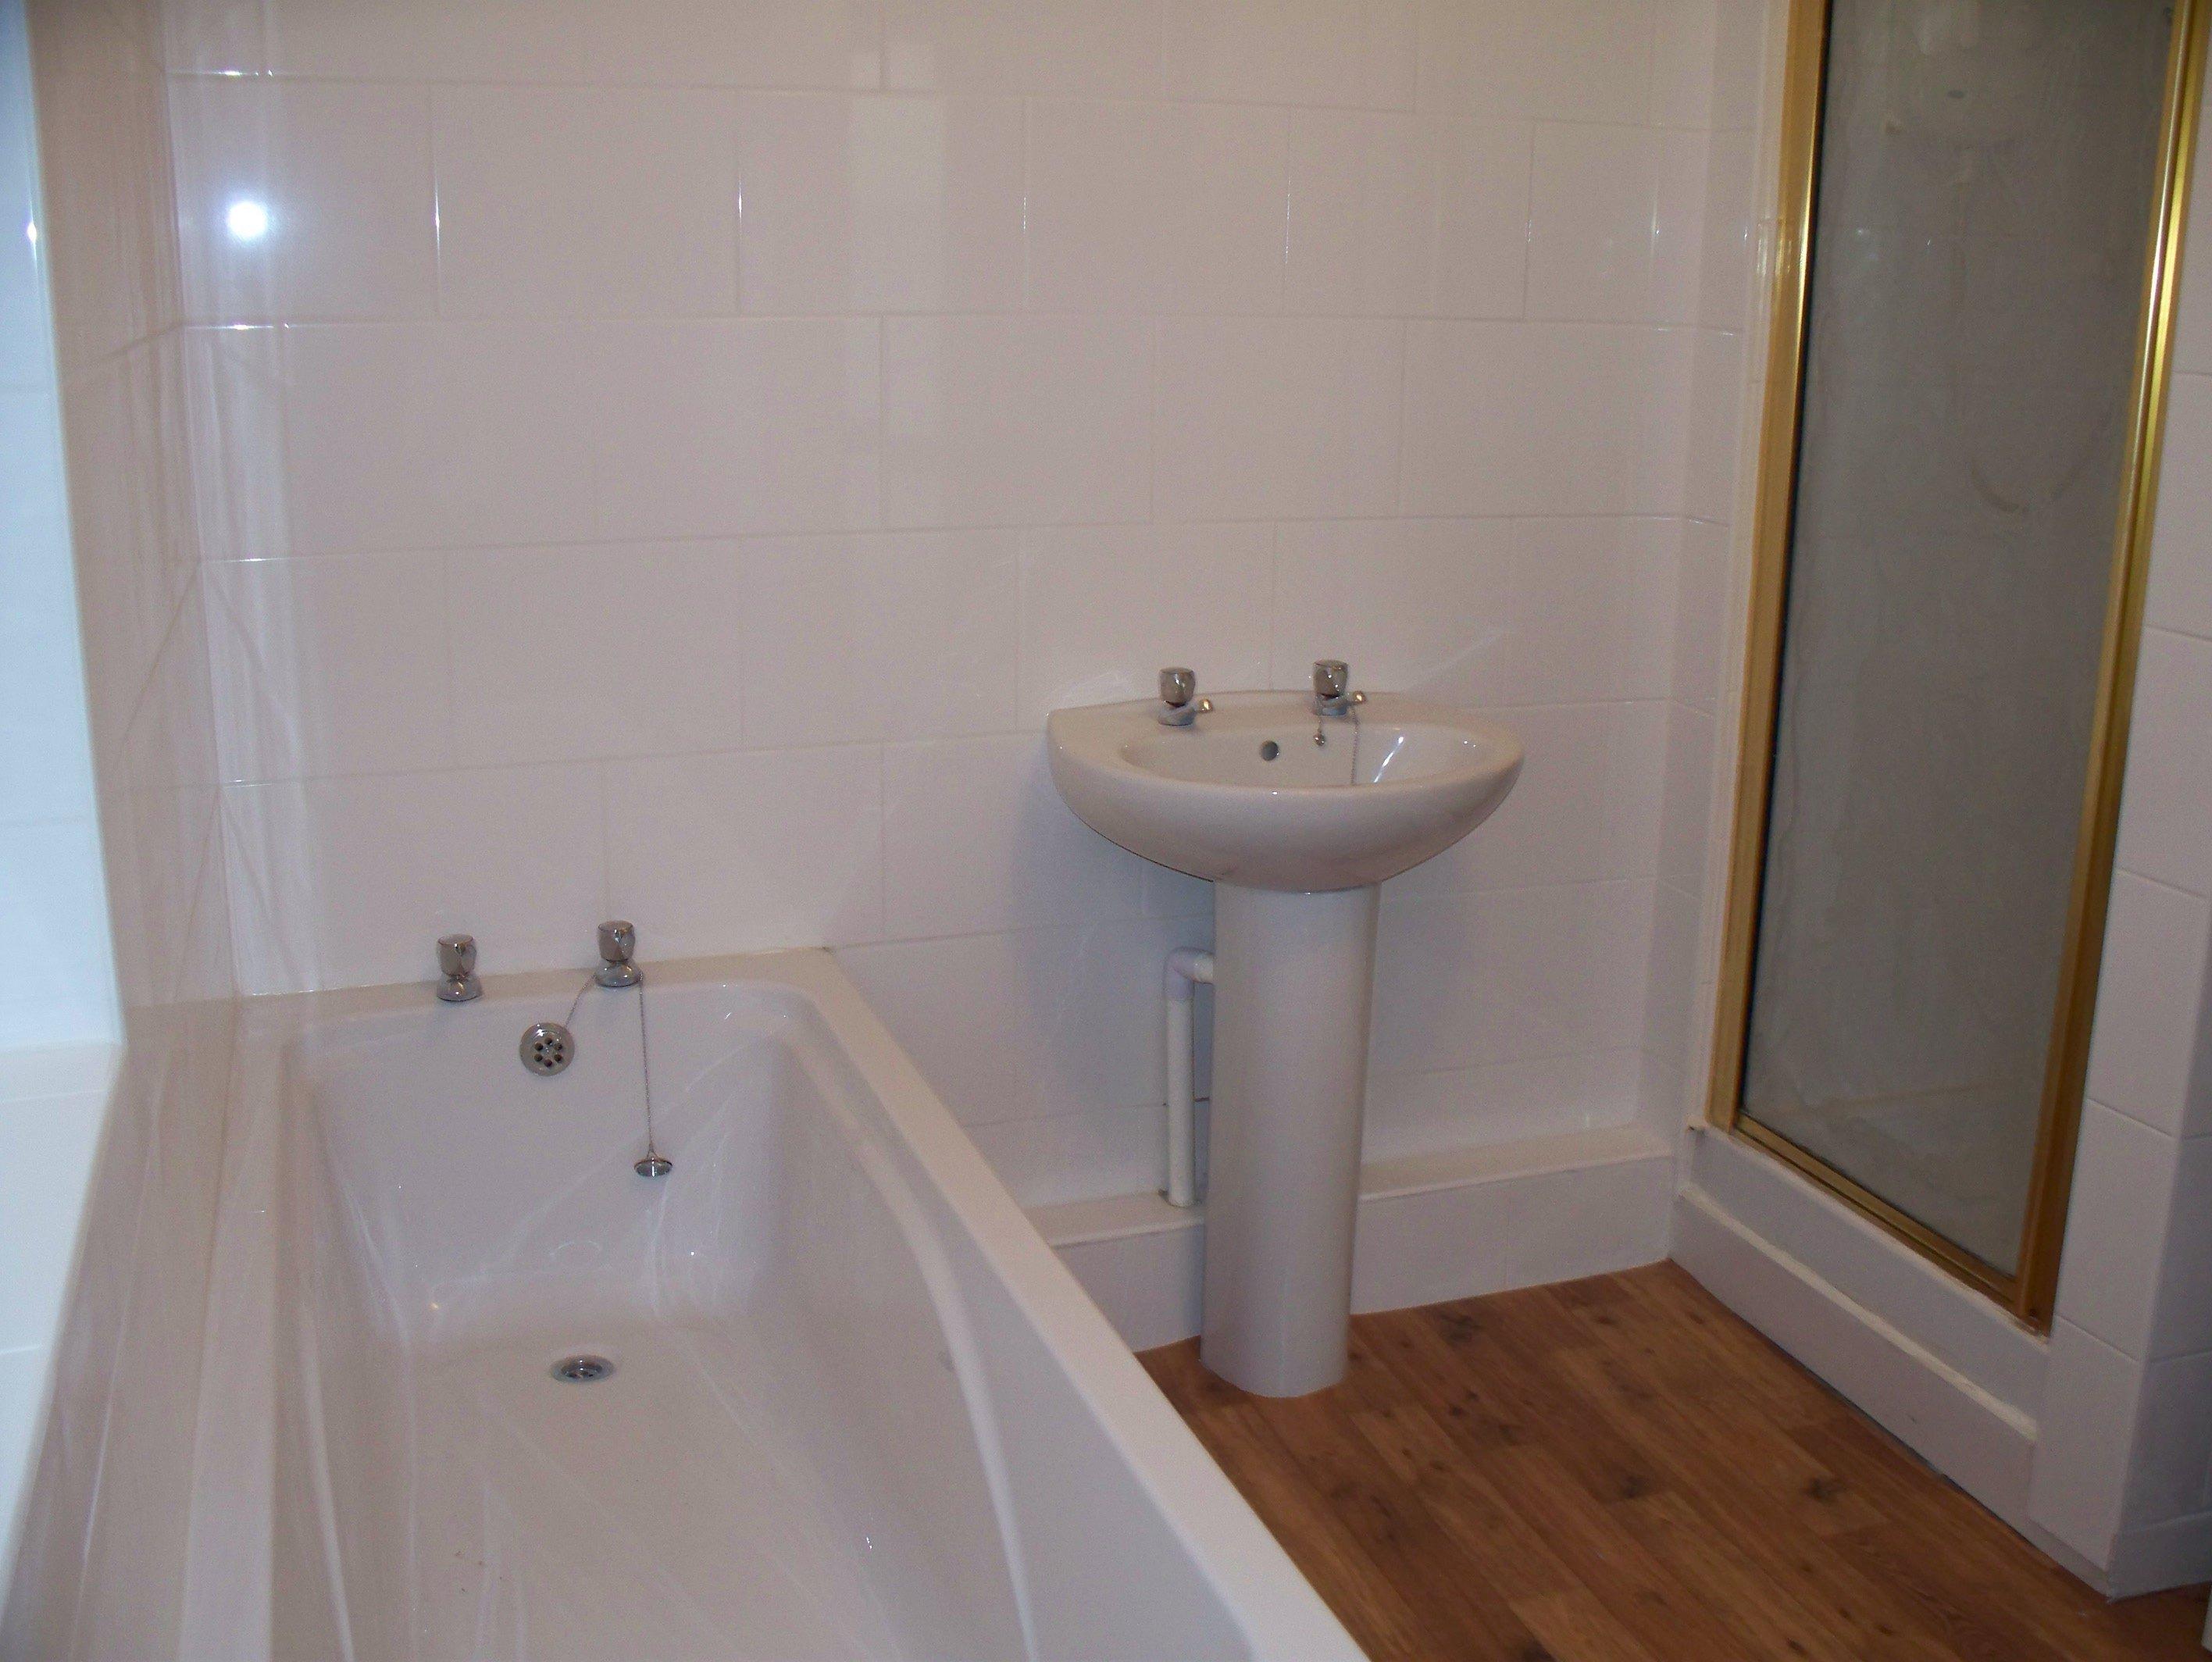 Wisemove. Property for sale. King Edward Street, Blaengarw. Bathroom